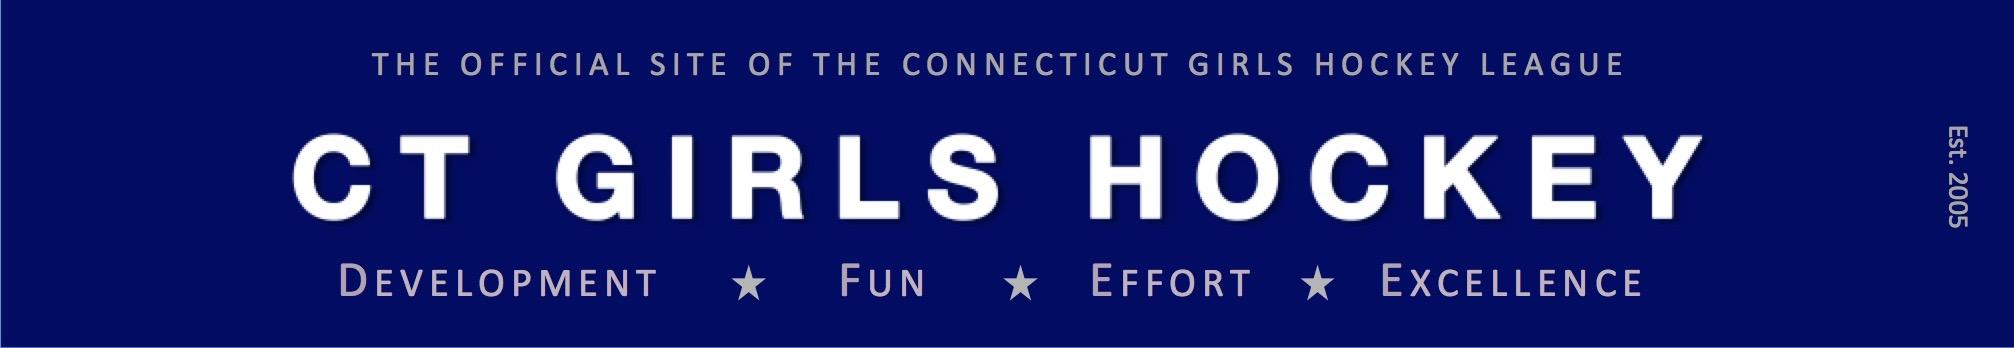 Connecticut Girls Hockey League, Inc., Hockey, Goal, Rink